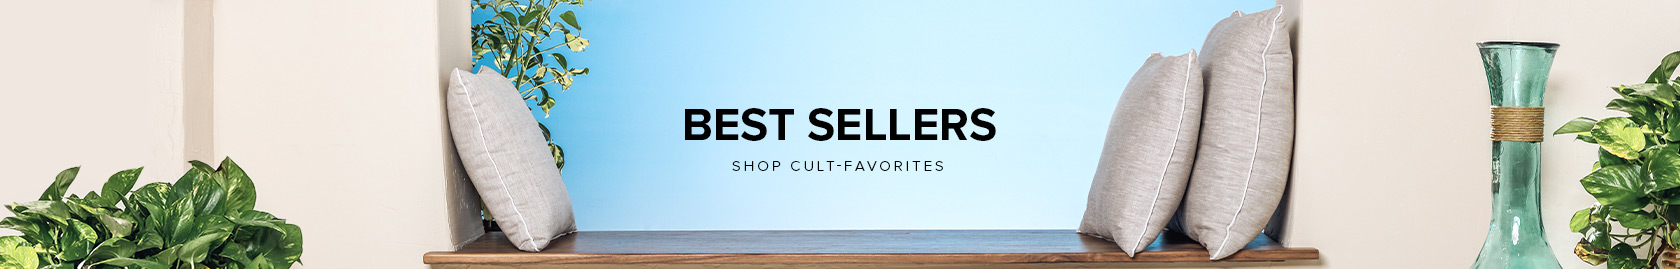 Best Sellers - Shop Cult Favorites